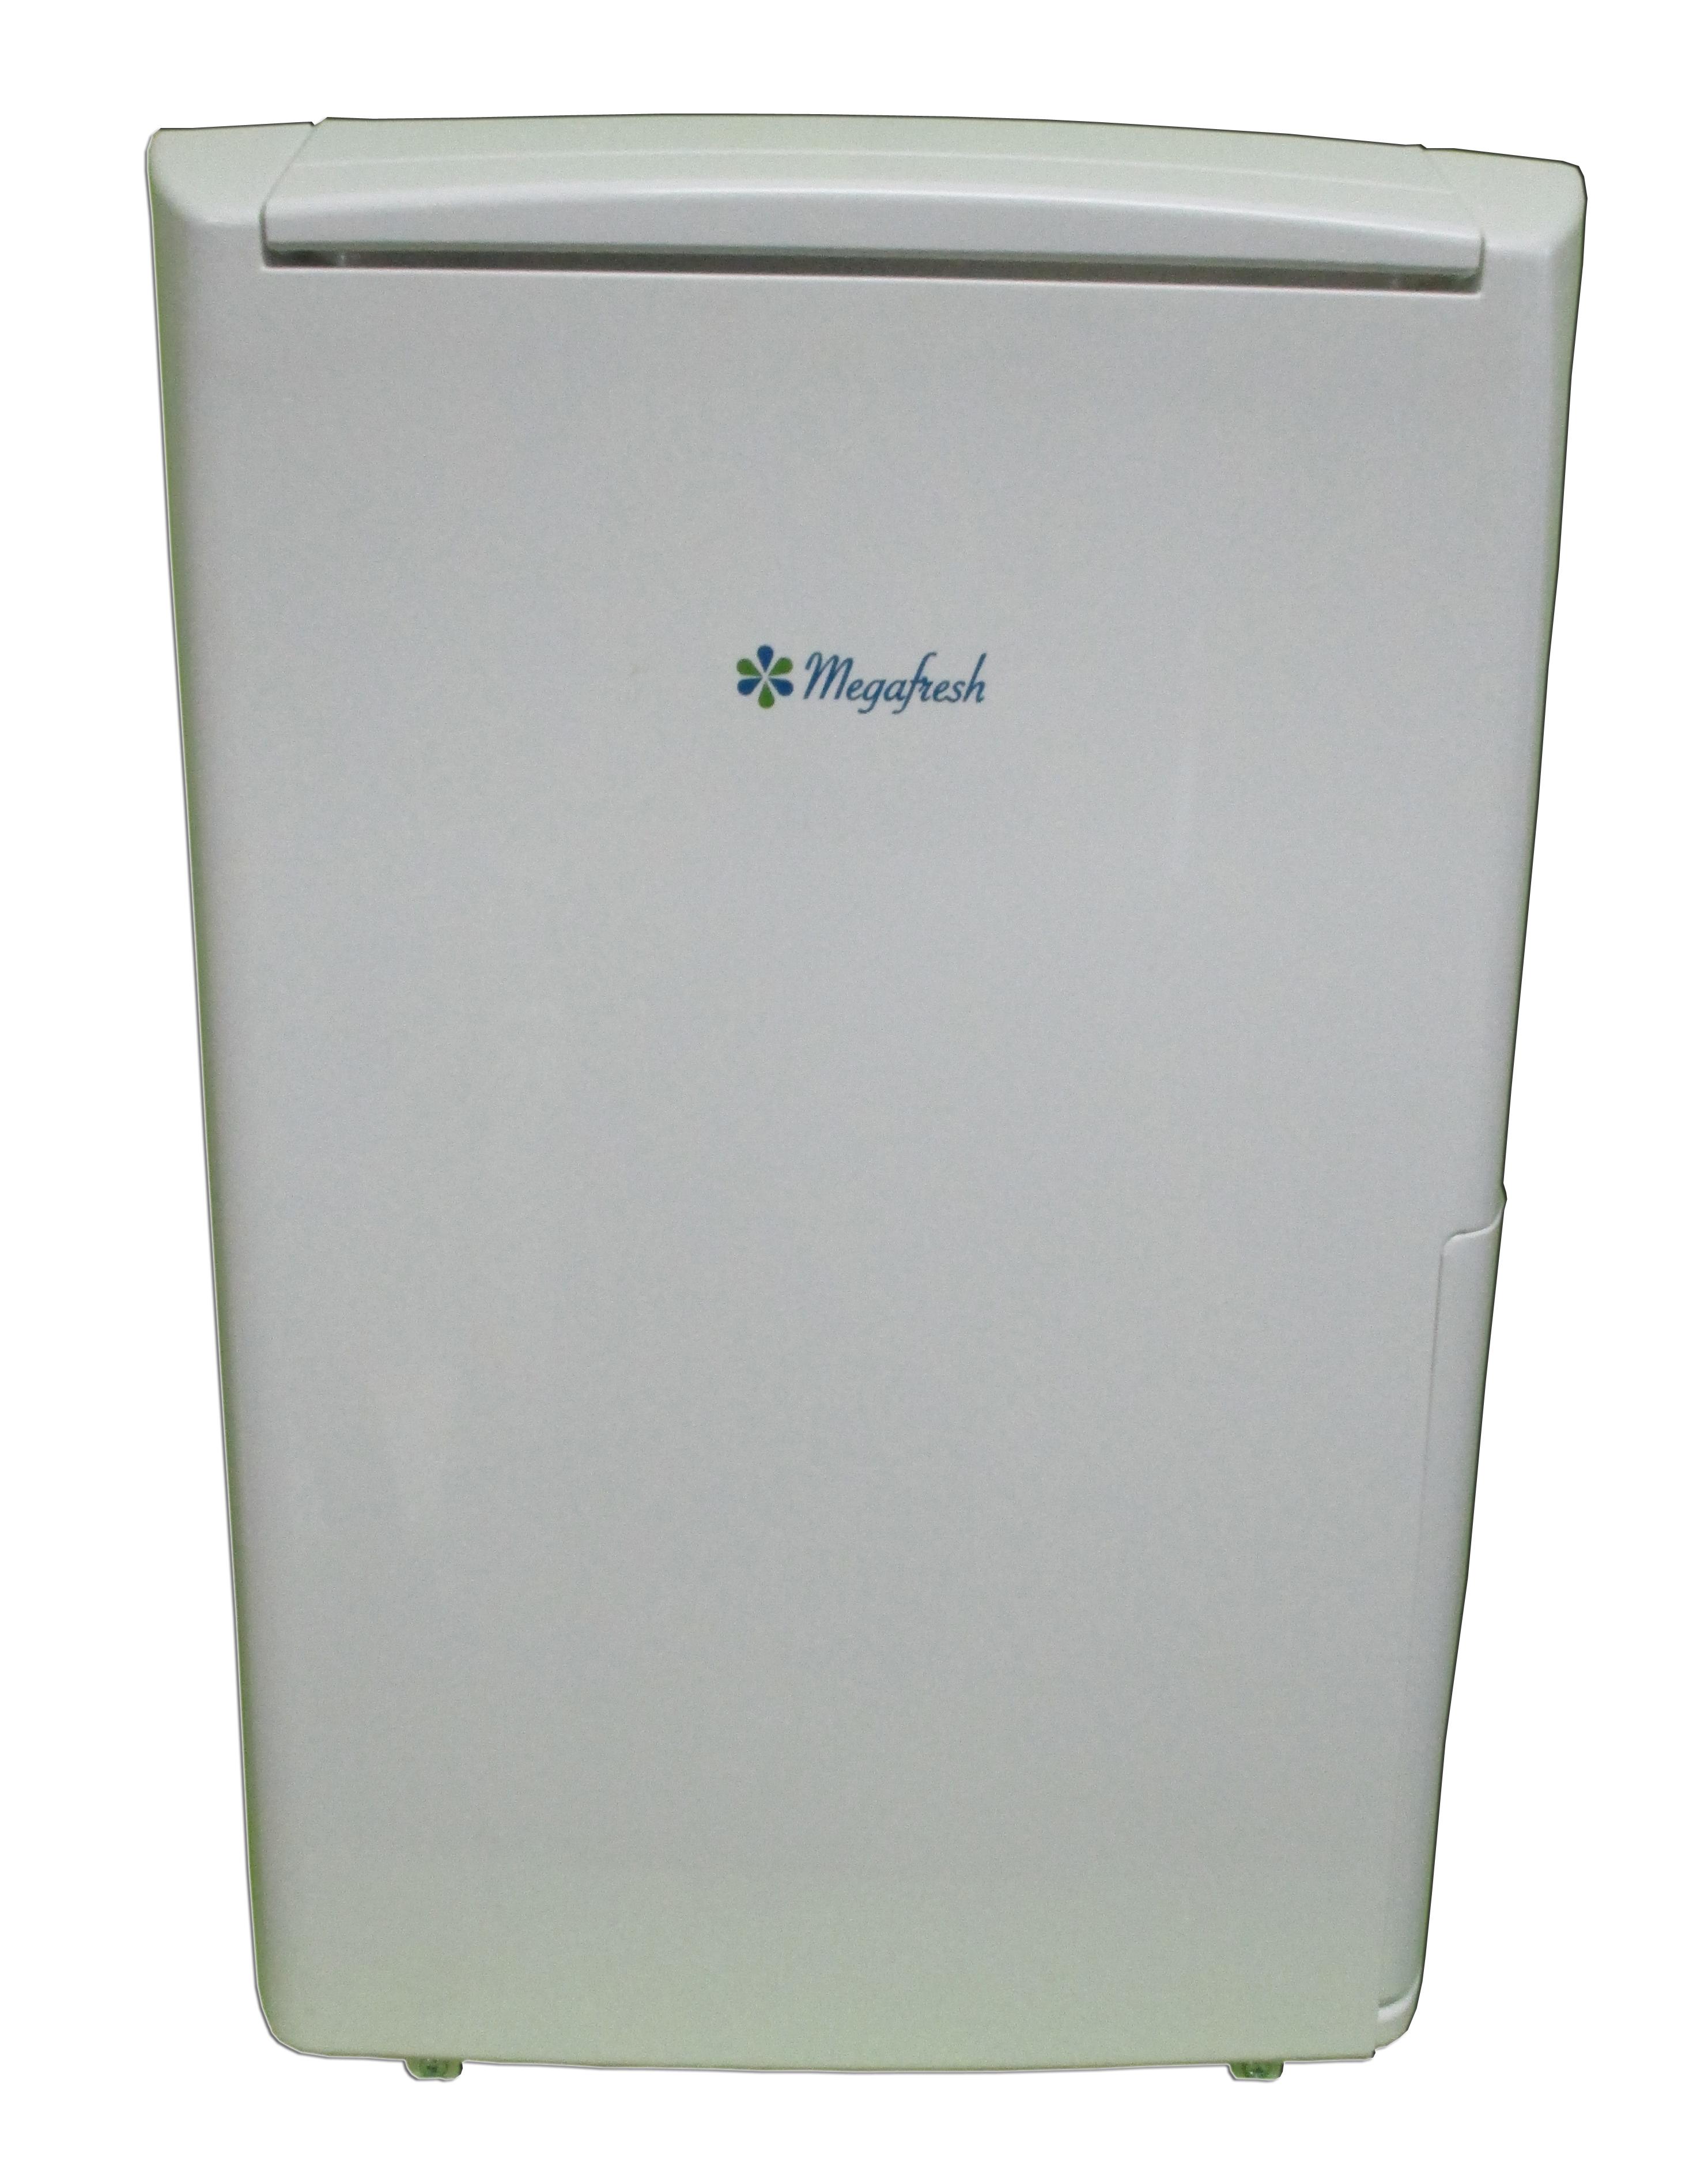 Megafresh Dehumidifier DYD-A20A